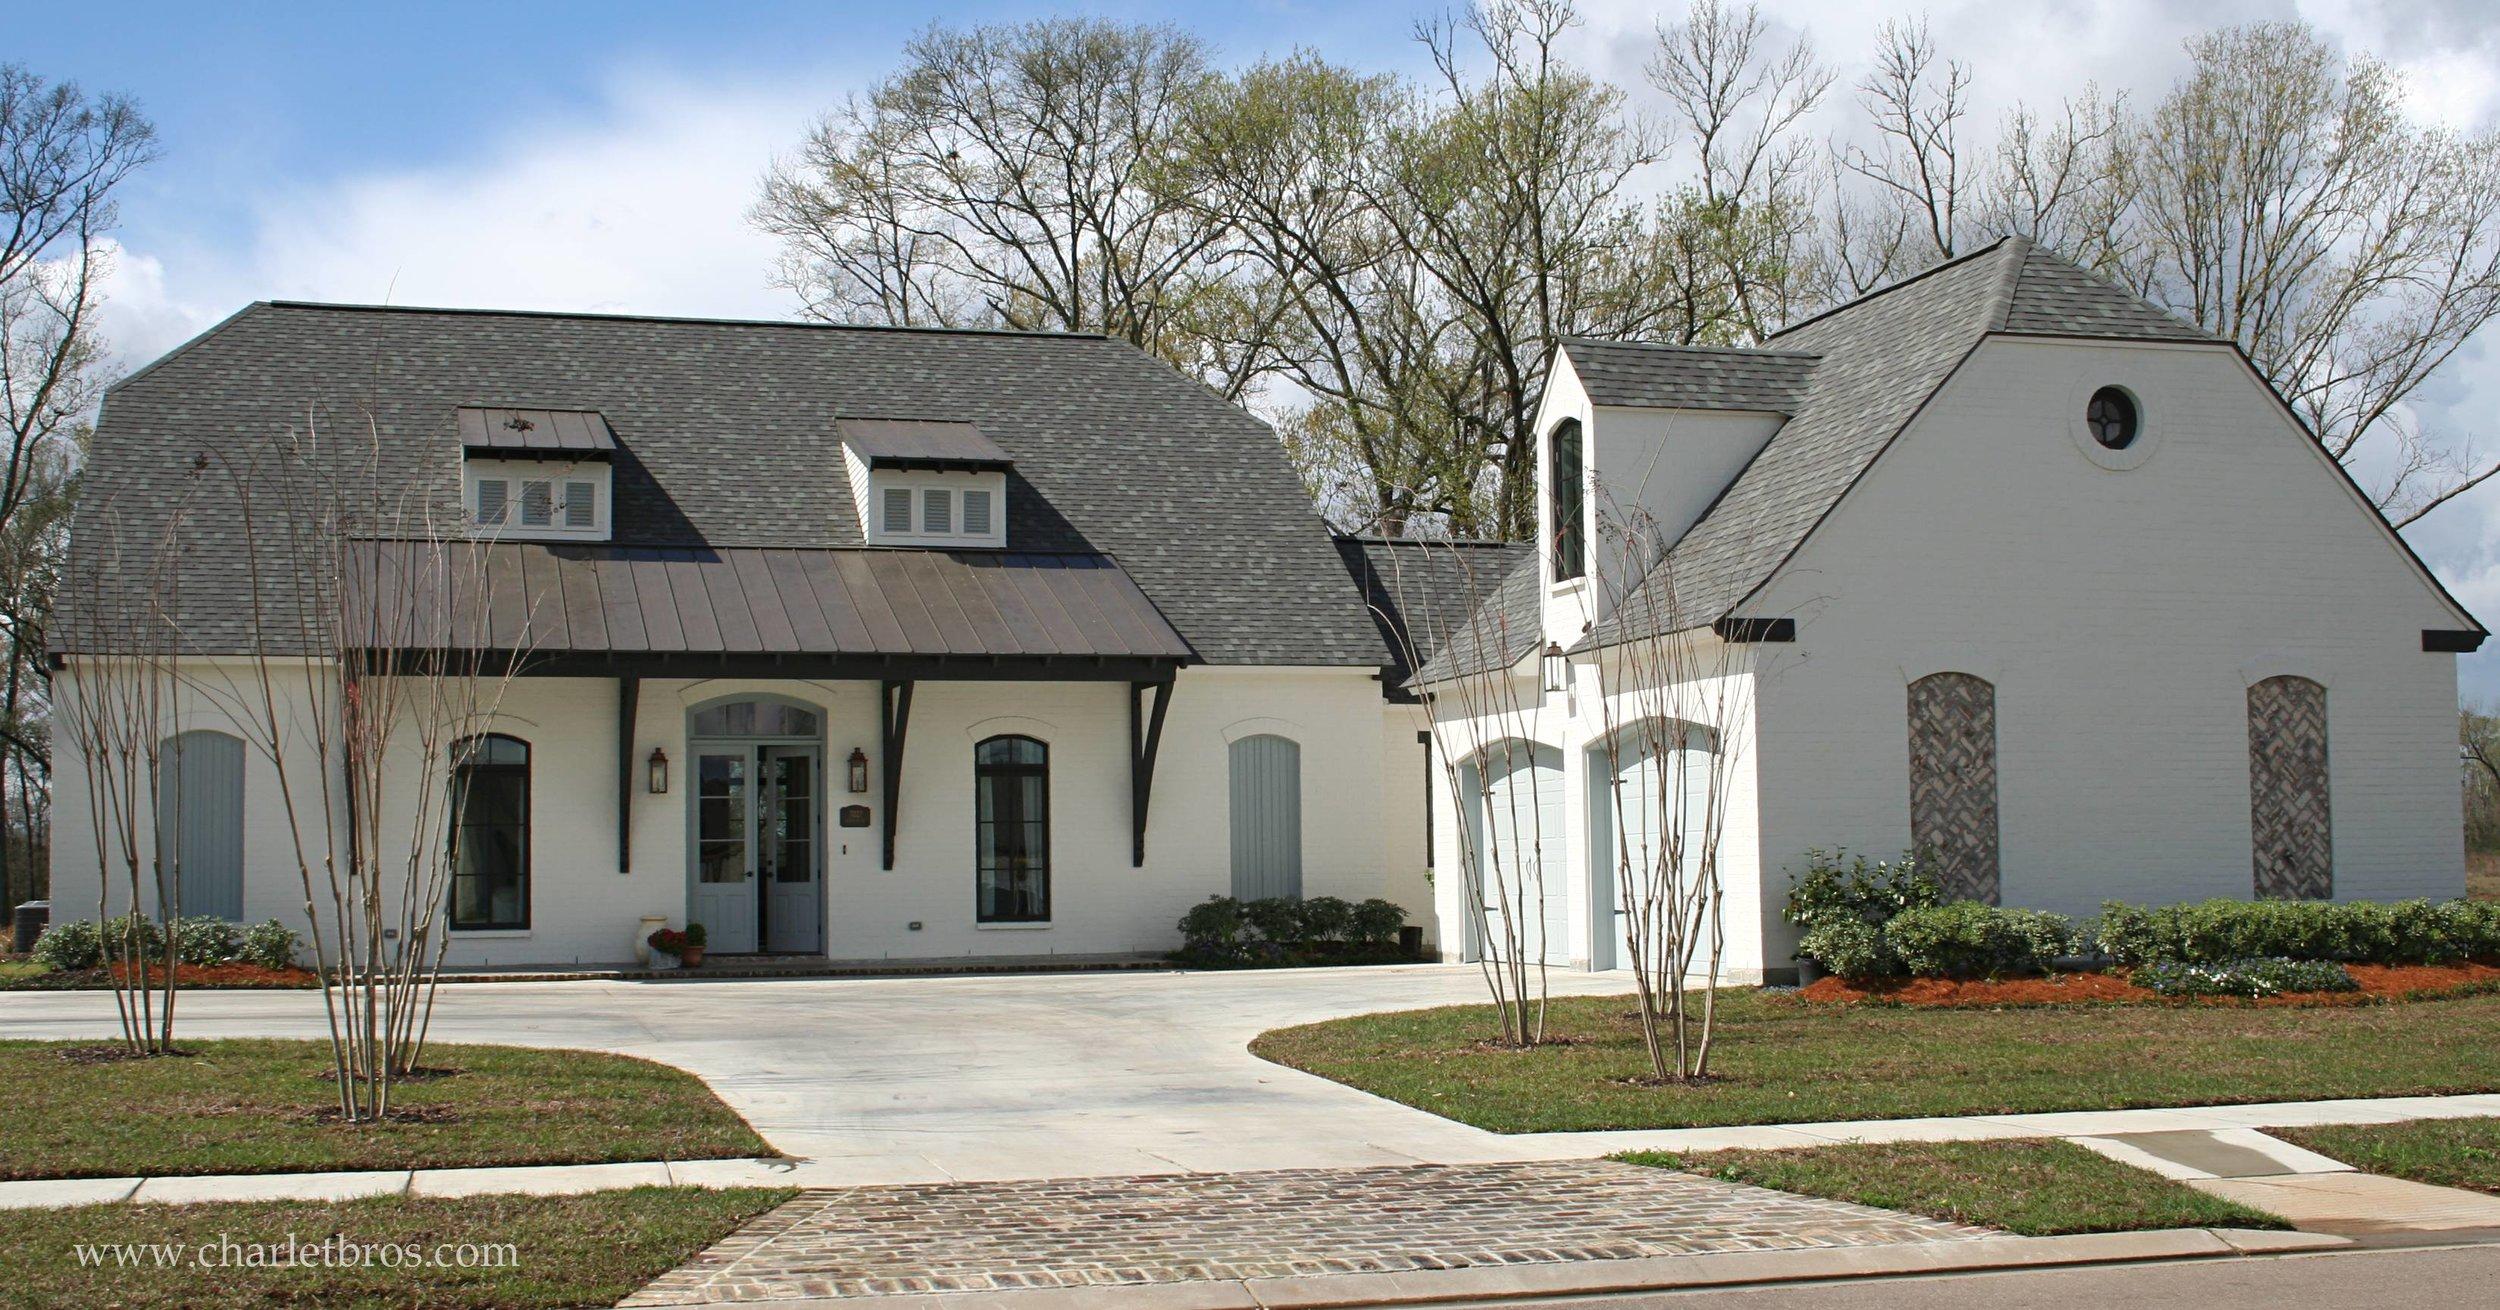 Clairemont exterior F.jpg